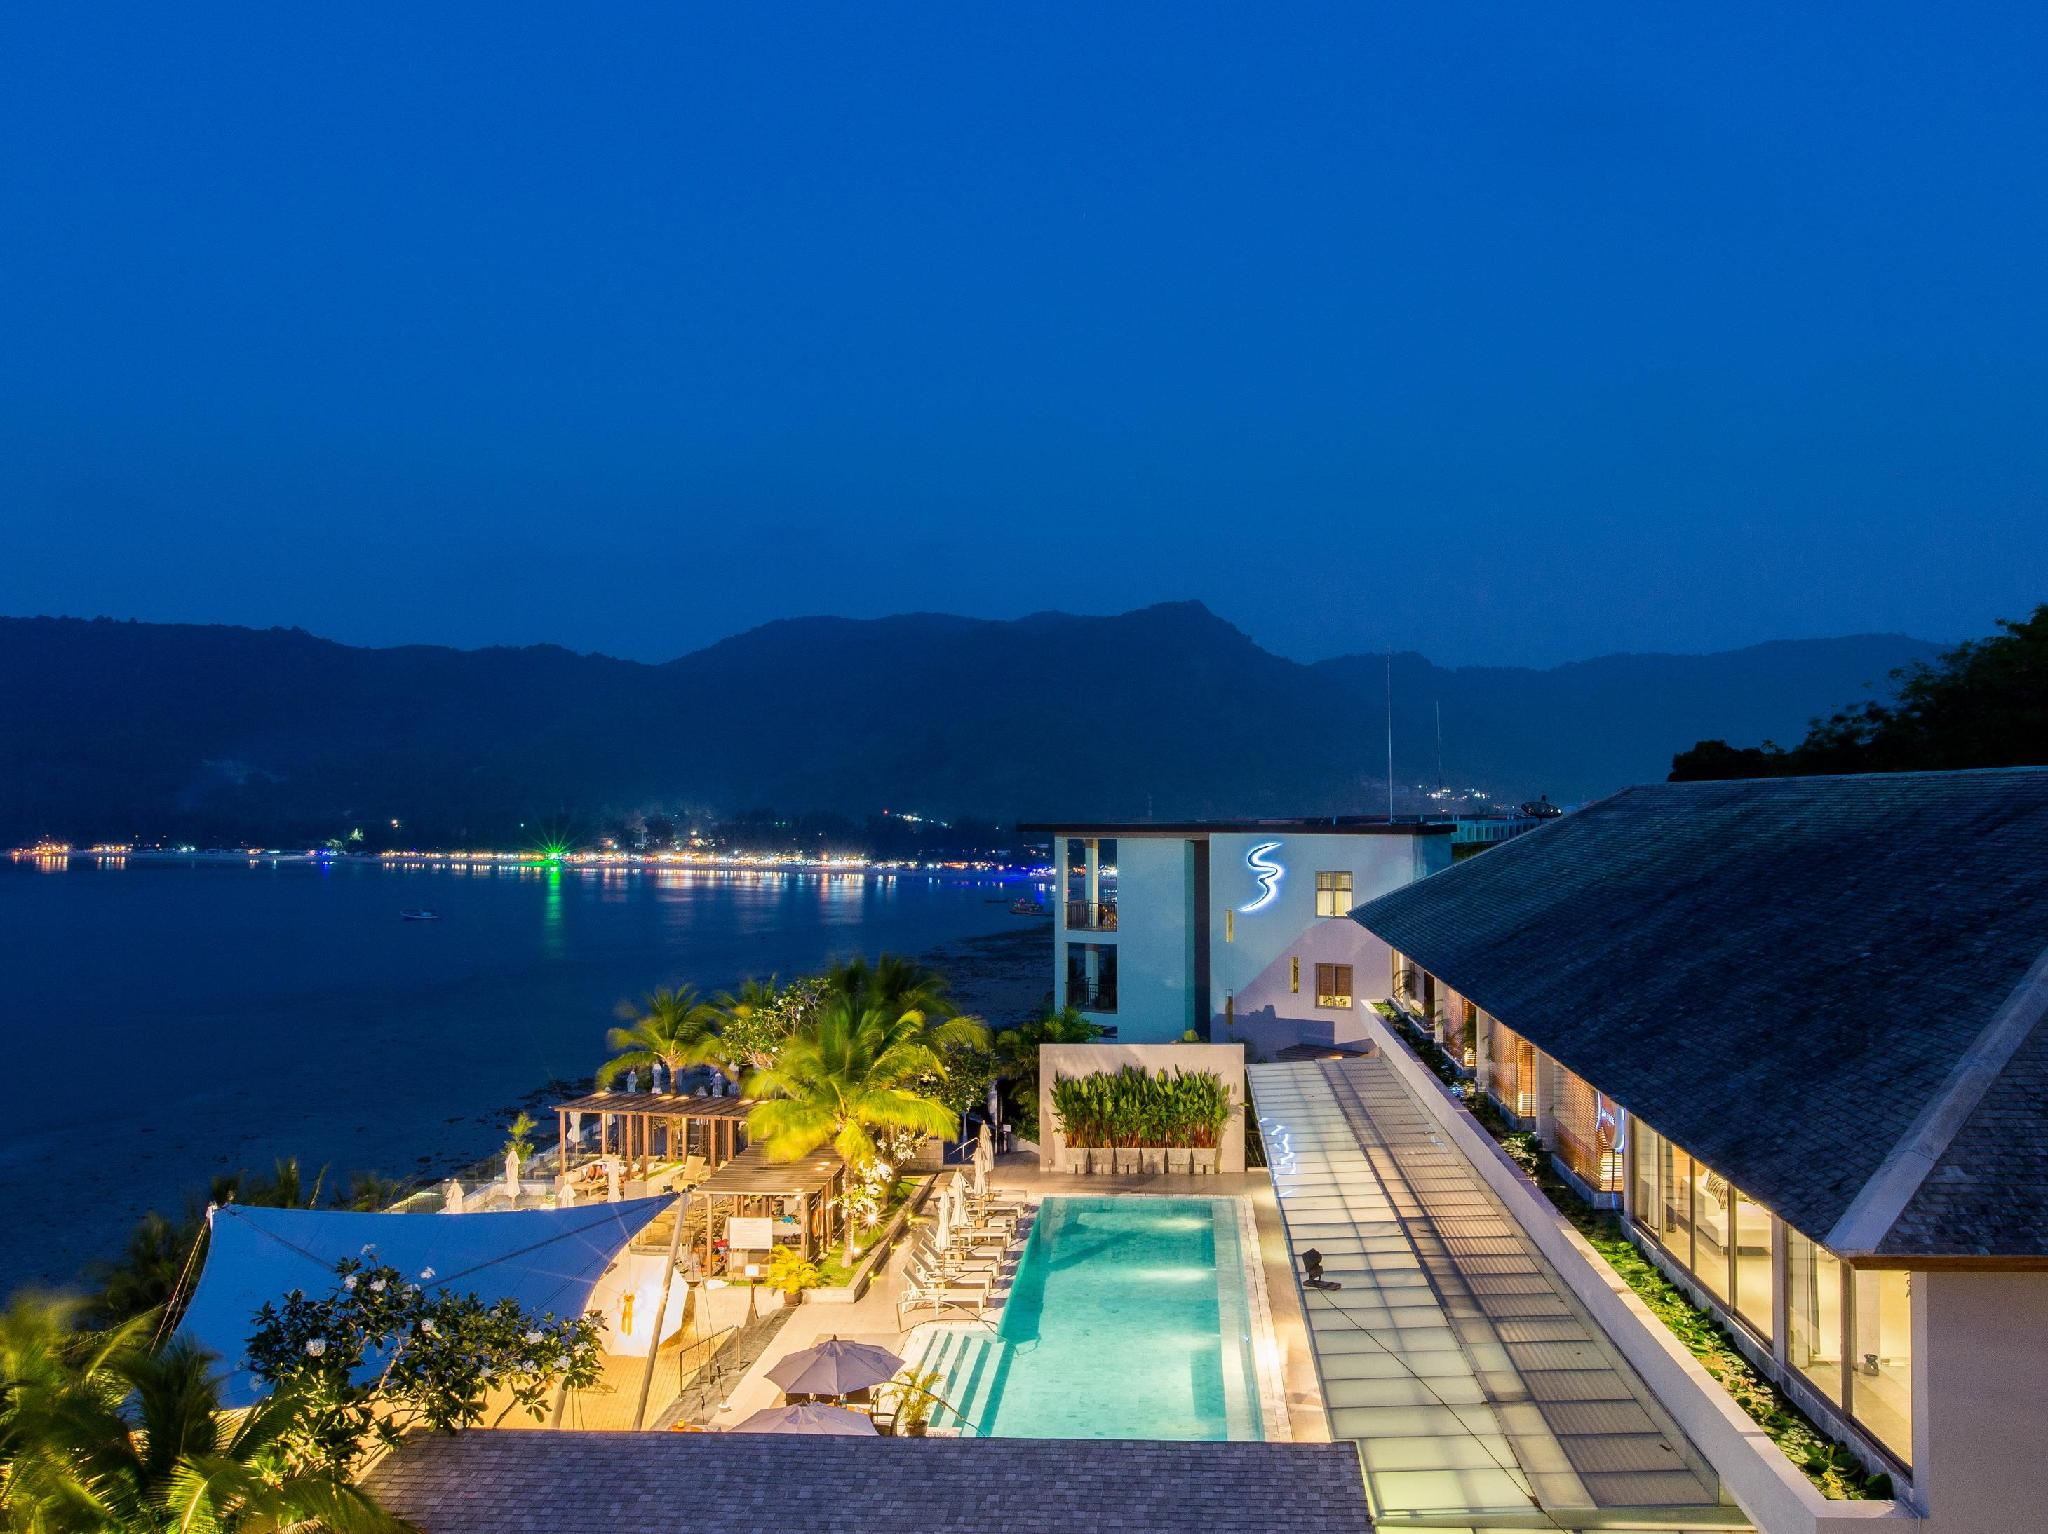 Cape Sienna Phuket Hotel and Villas0